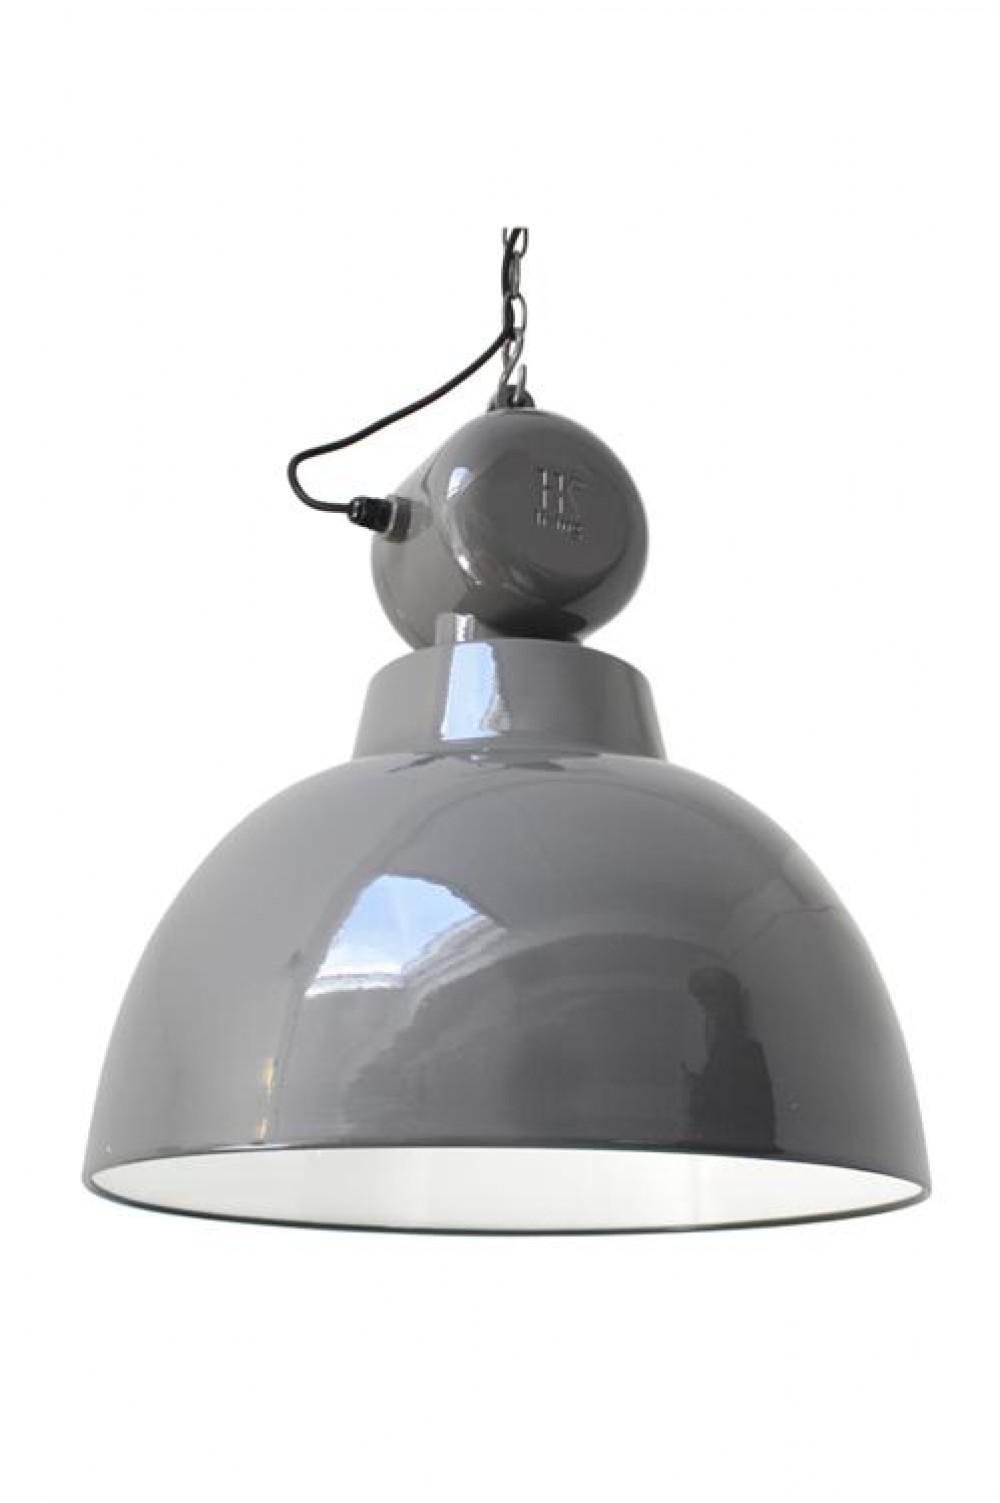 Pendelleuchte Fabrikart Industriedesign Lampe Farbe Grau O 50 Cm